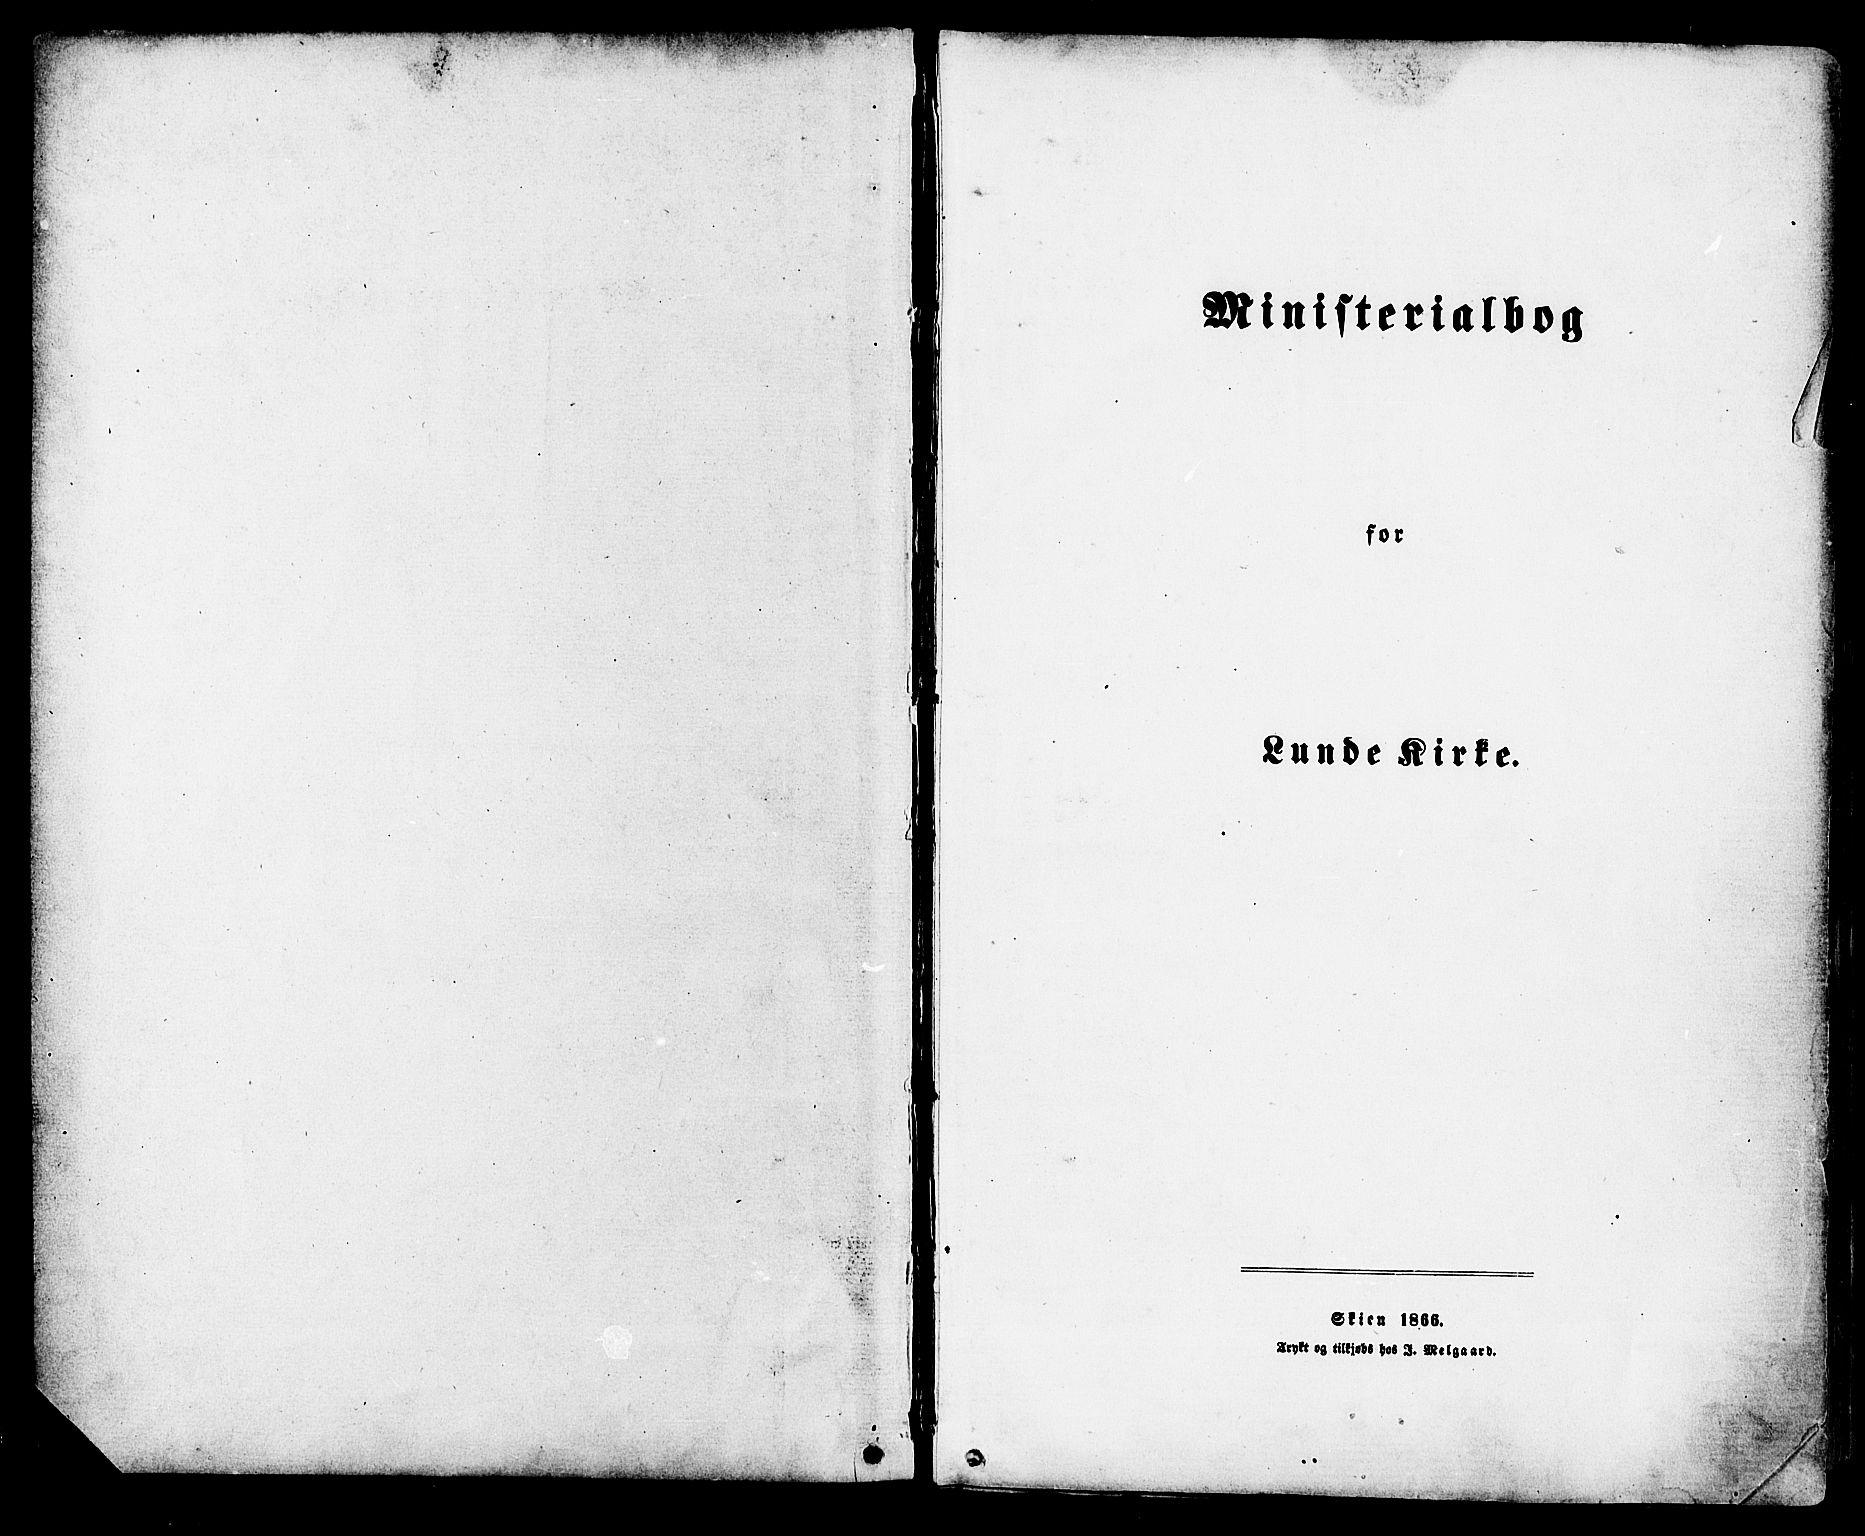 SAKO, Lunde kirkebøker, F/Fa/L0001: Ministerialbok nr. I 1, 1866-1883